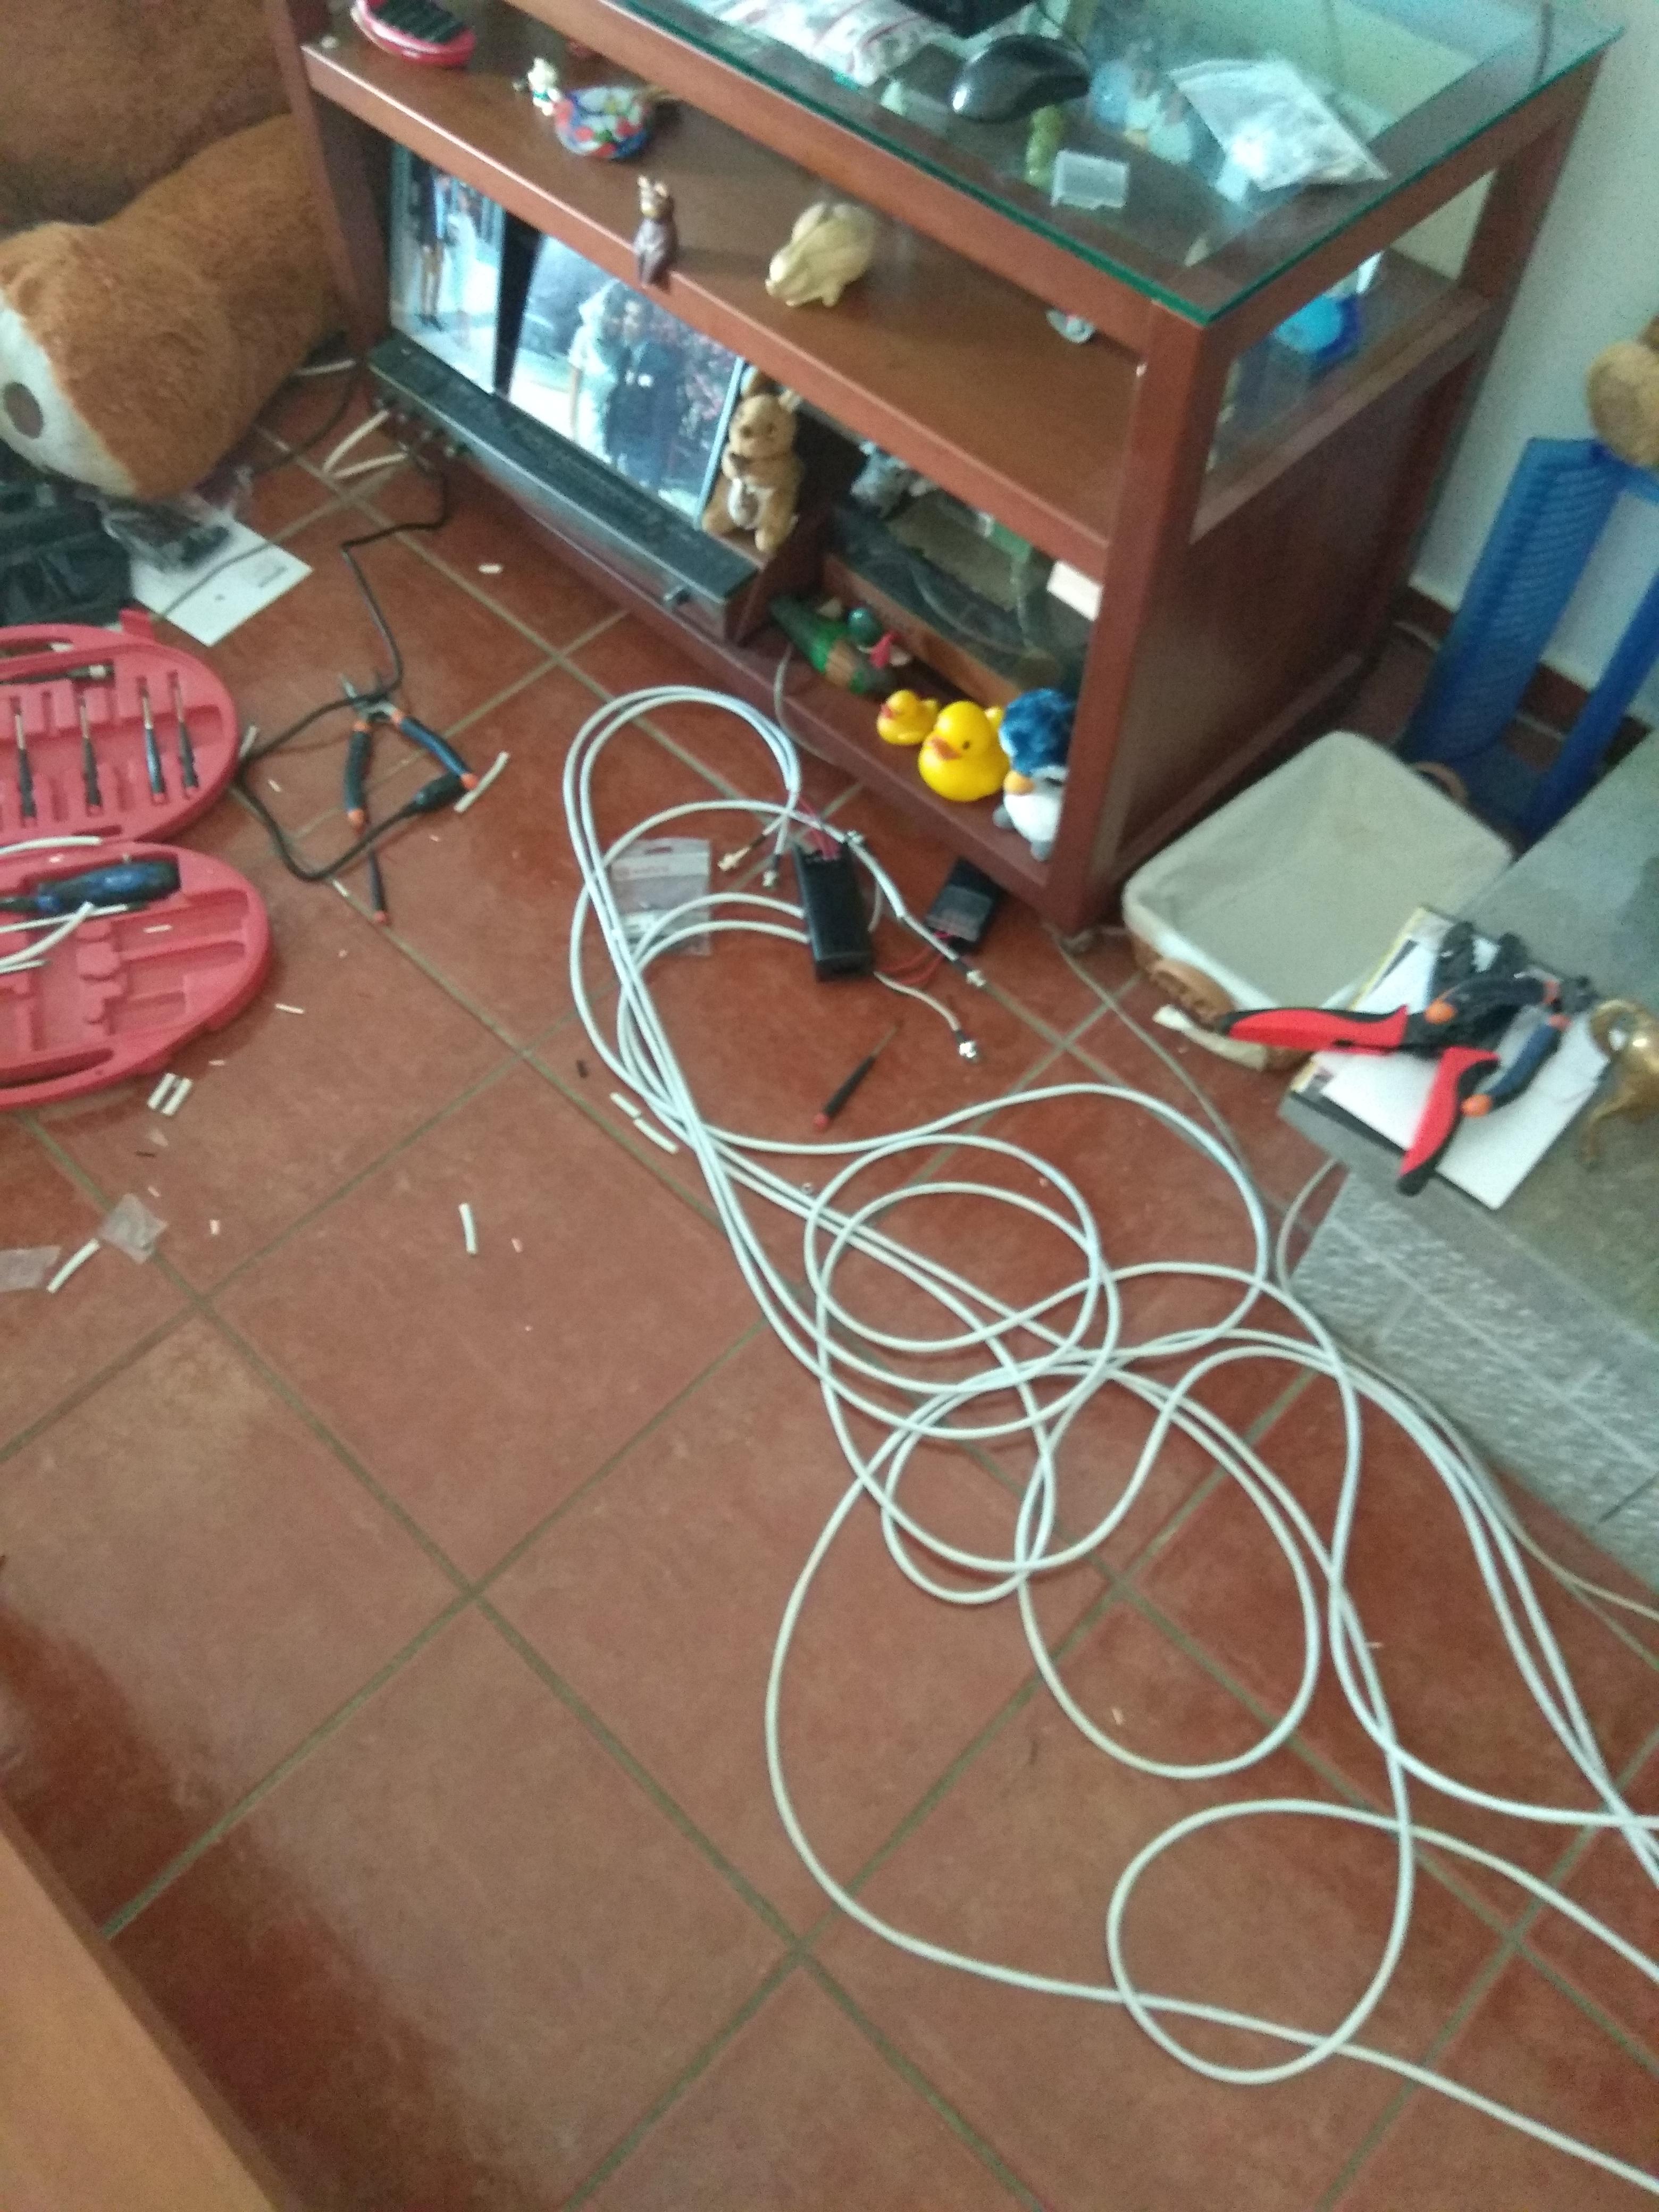 video vigilância assistência técnica